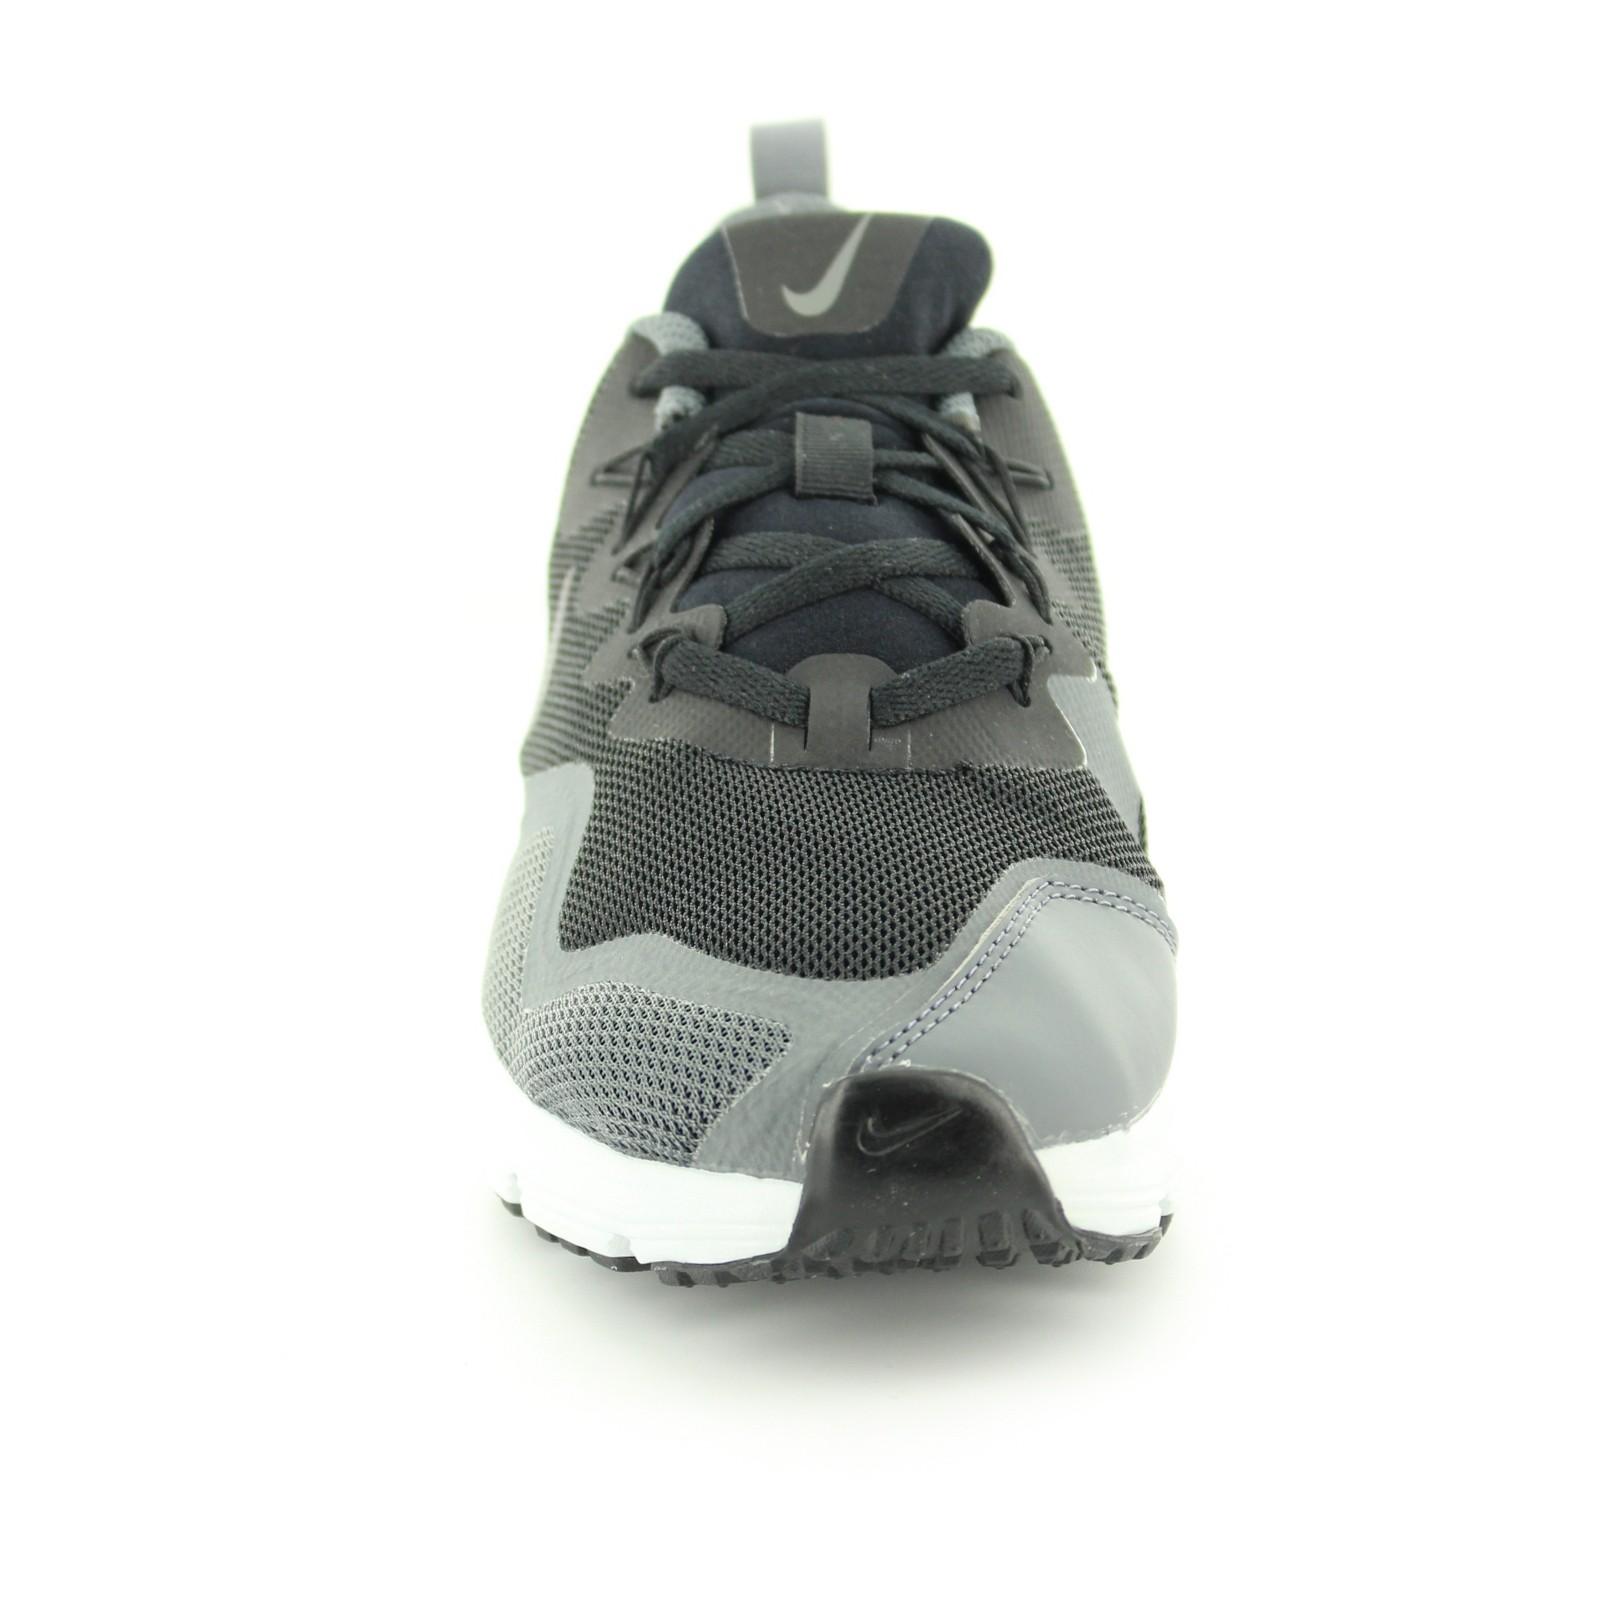 8ba112db sneakers running Nike nike air max fury (gs) - Pantofi sport pentru ...